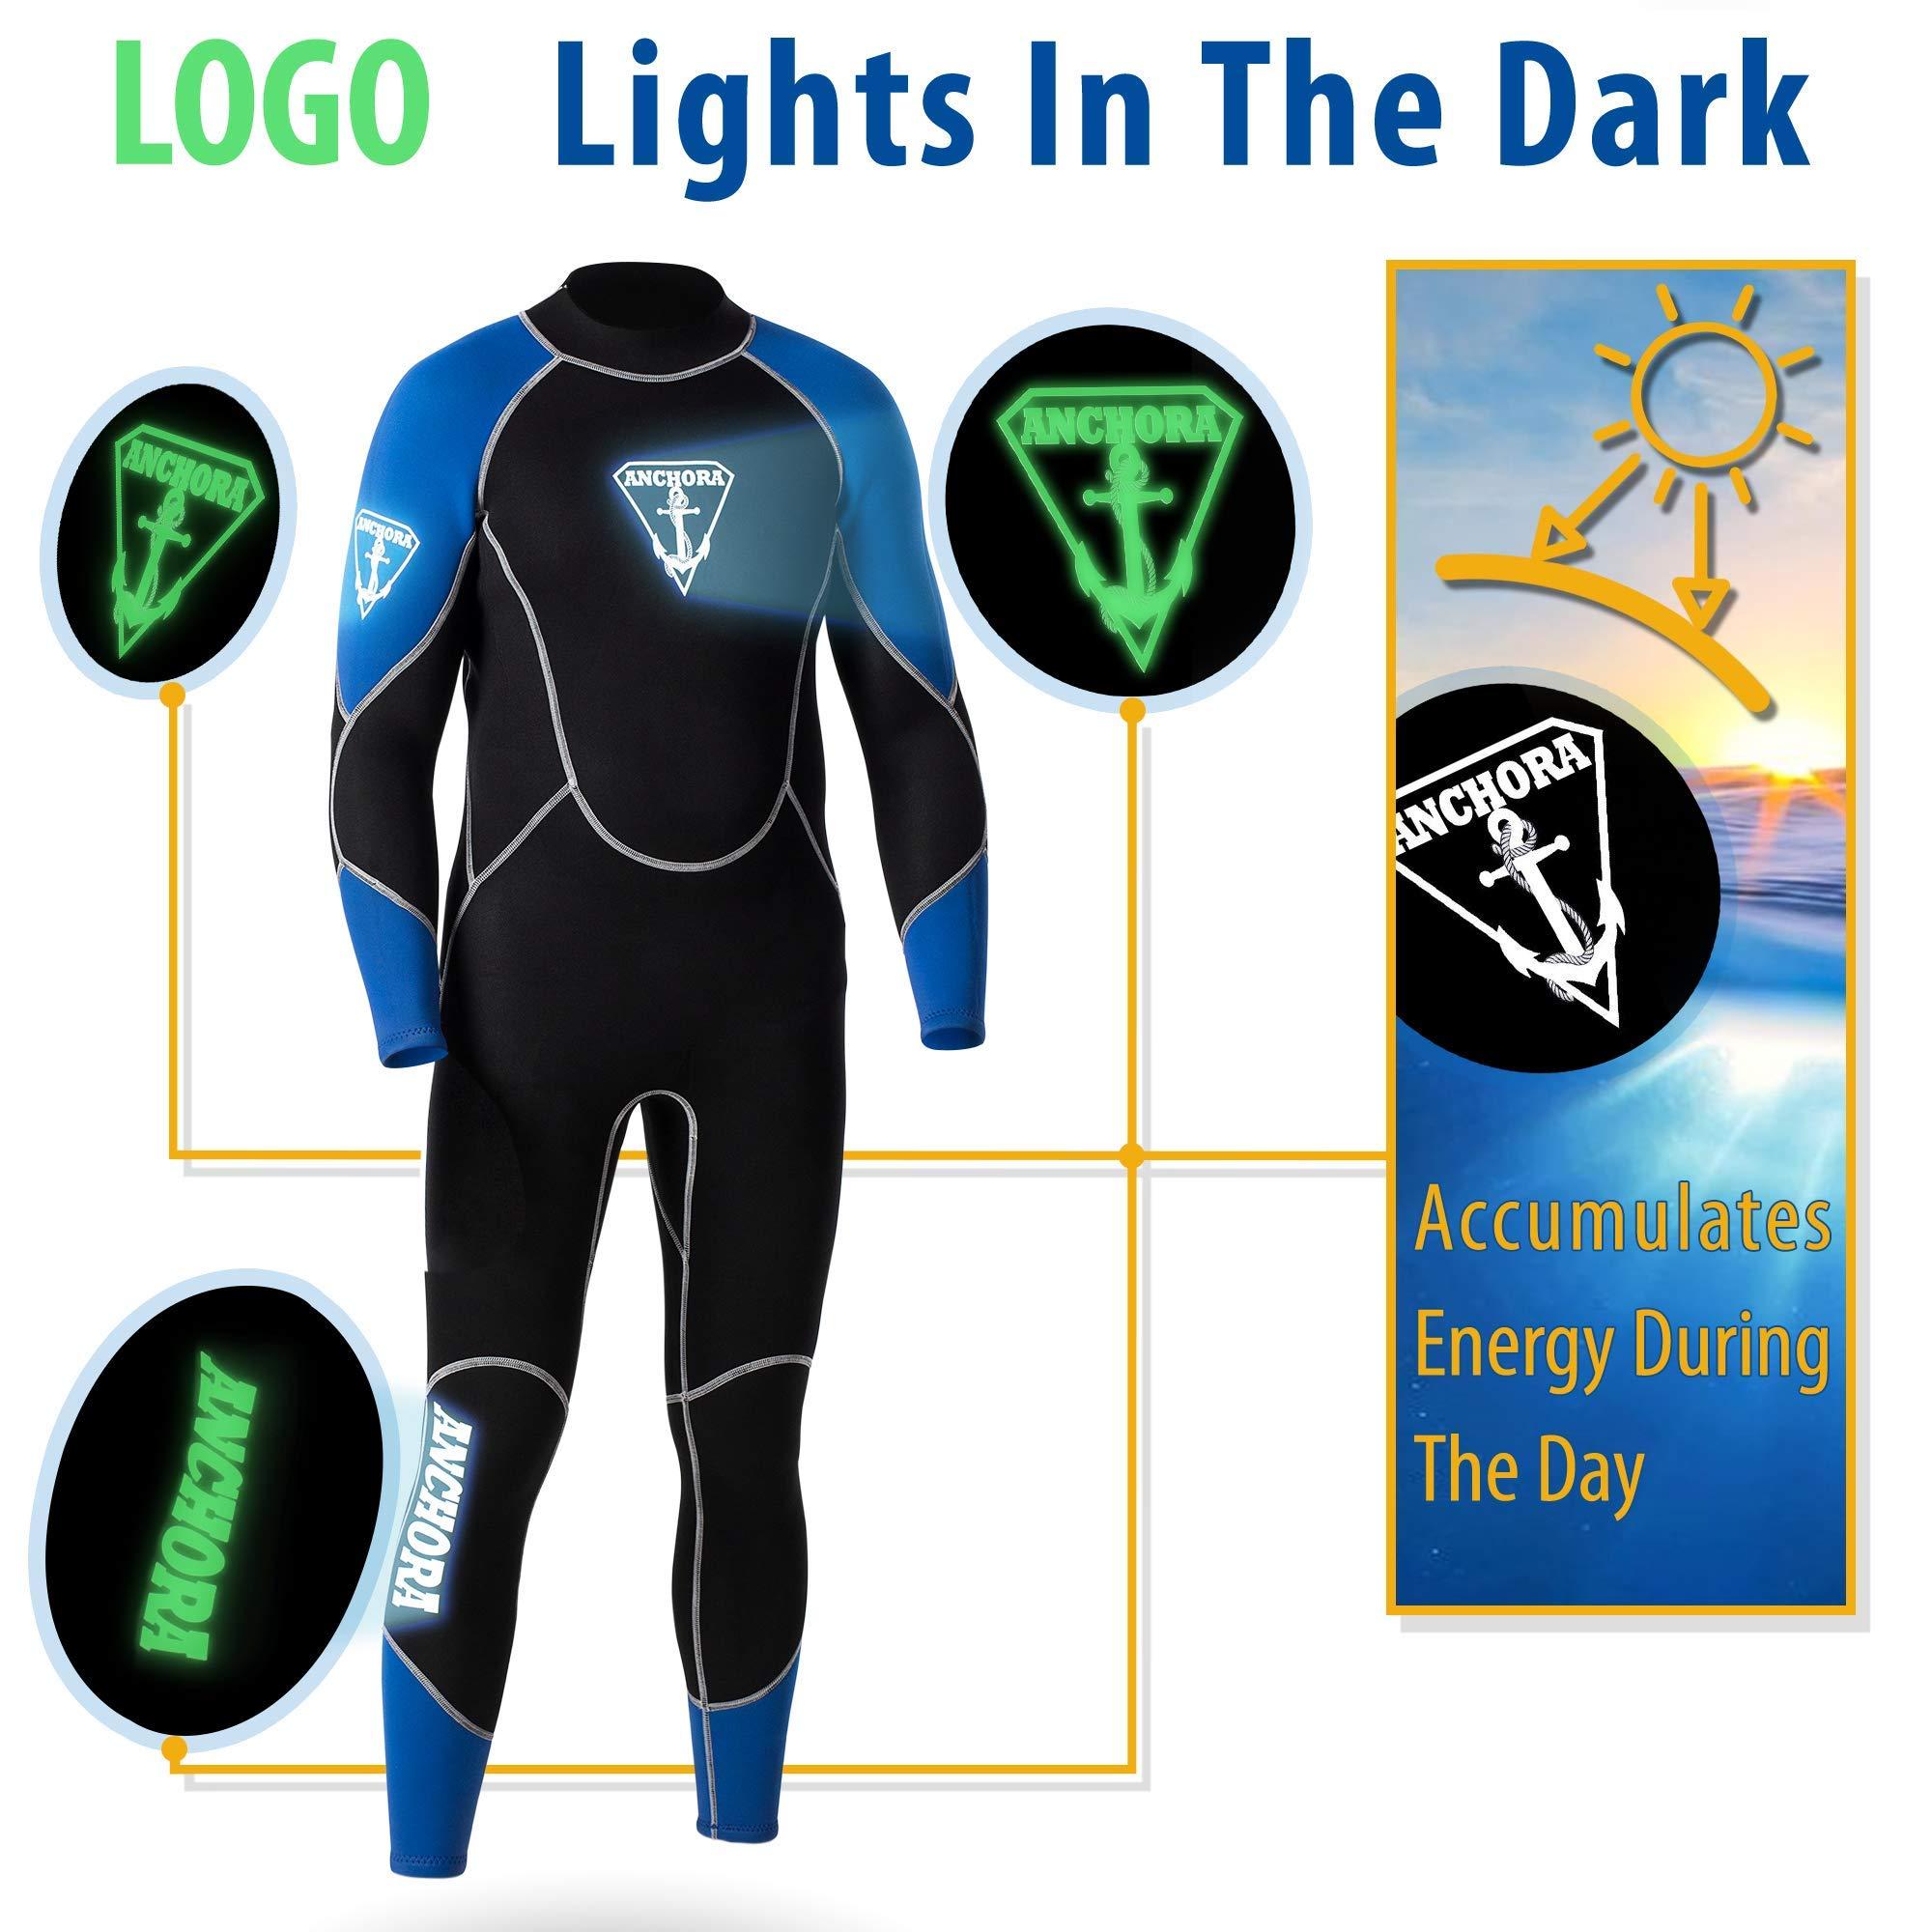 Anchora Men's Scuba Diving Full Wetsuit (Black), No Color, Size X-Large by Anchora